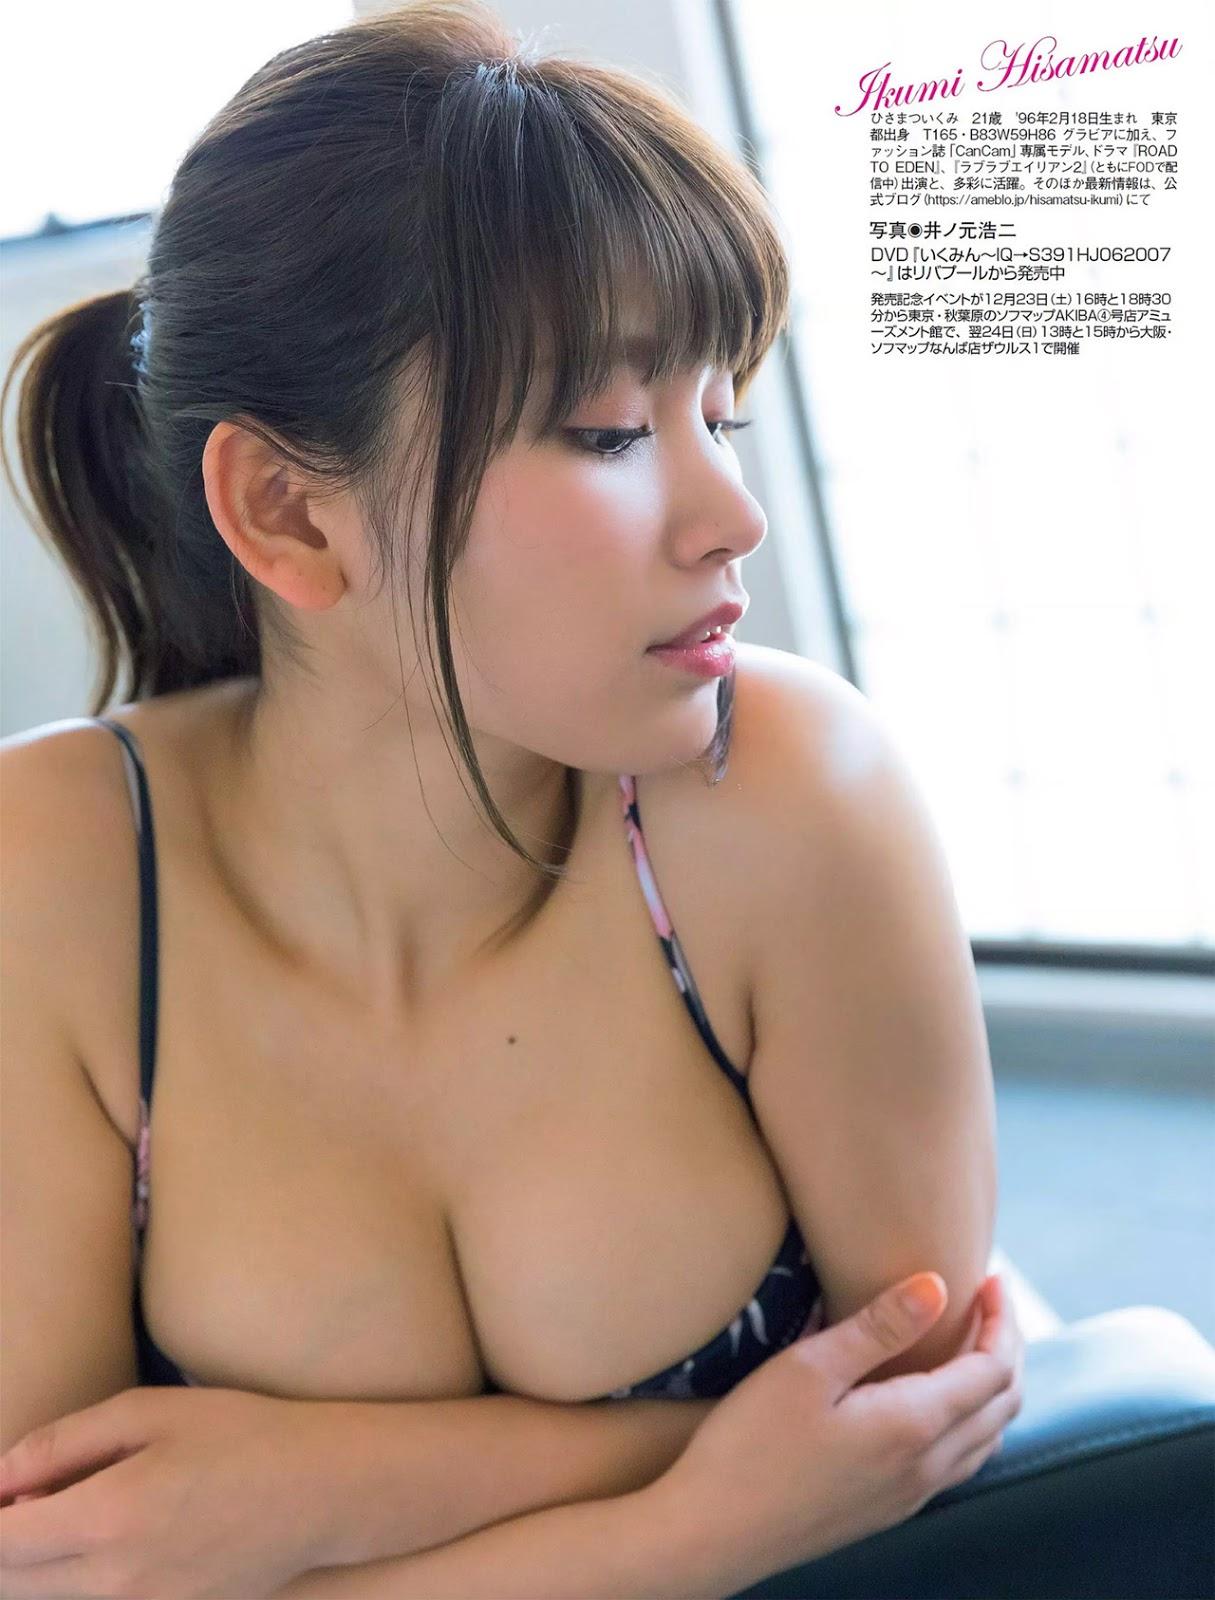 Ikumi Hisamatsu 久松郁実, FLASH 電子版 2017.12.19 (フラッシュ 2017年12月19日号)